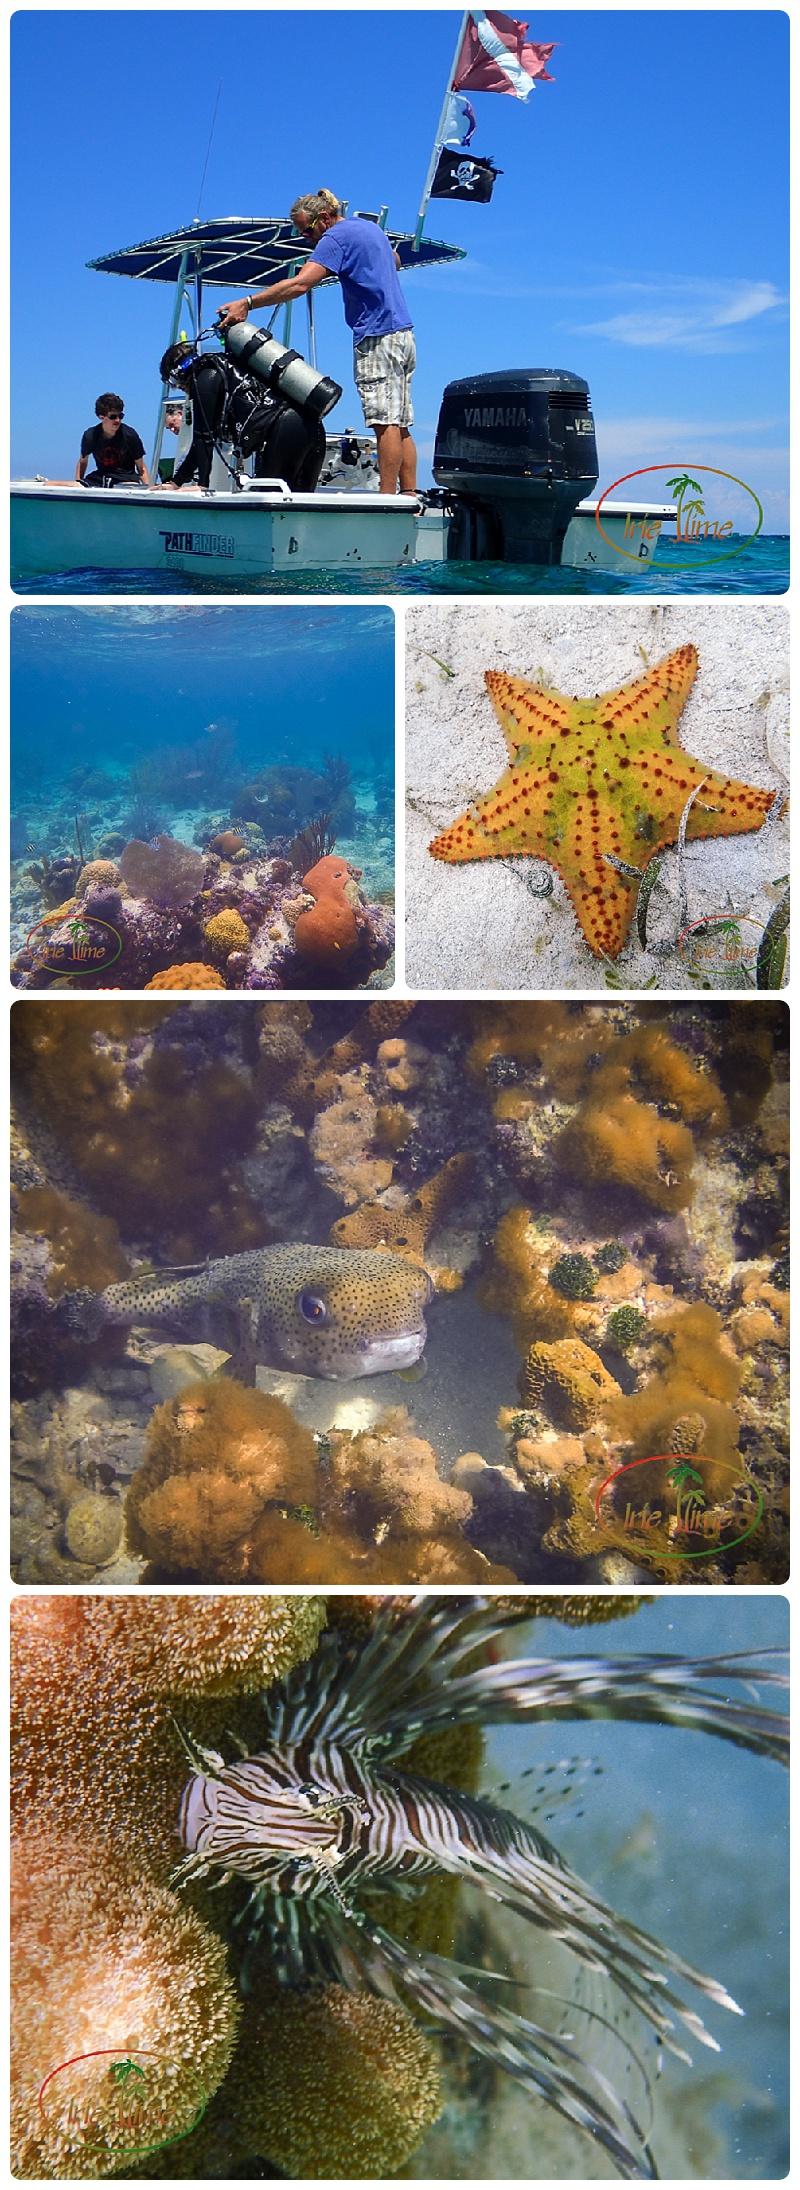 Snorkeling and Diving, Kamalame Cay, Andros Bahamas #bahamas #kamalamecay #iheartkamalame #honeymoon